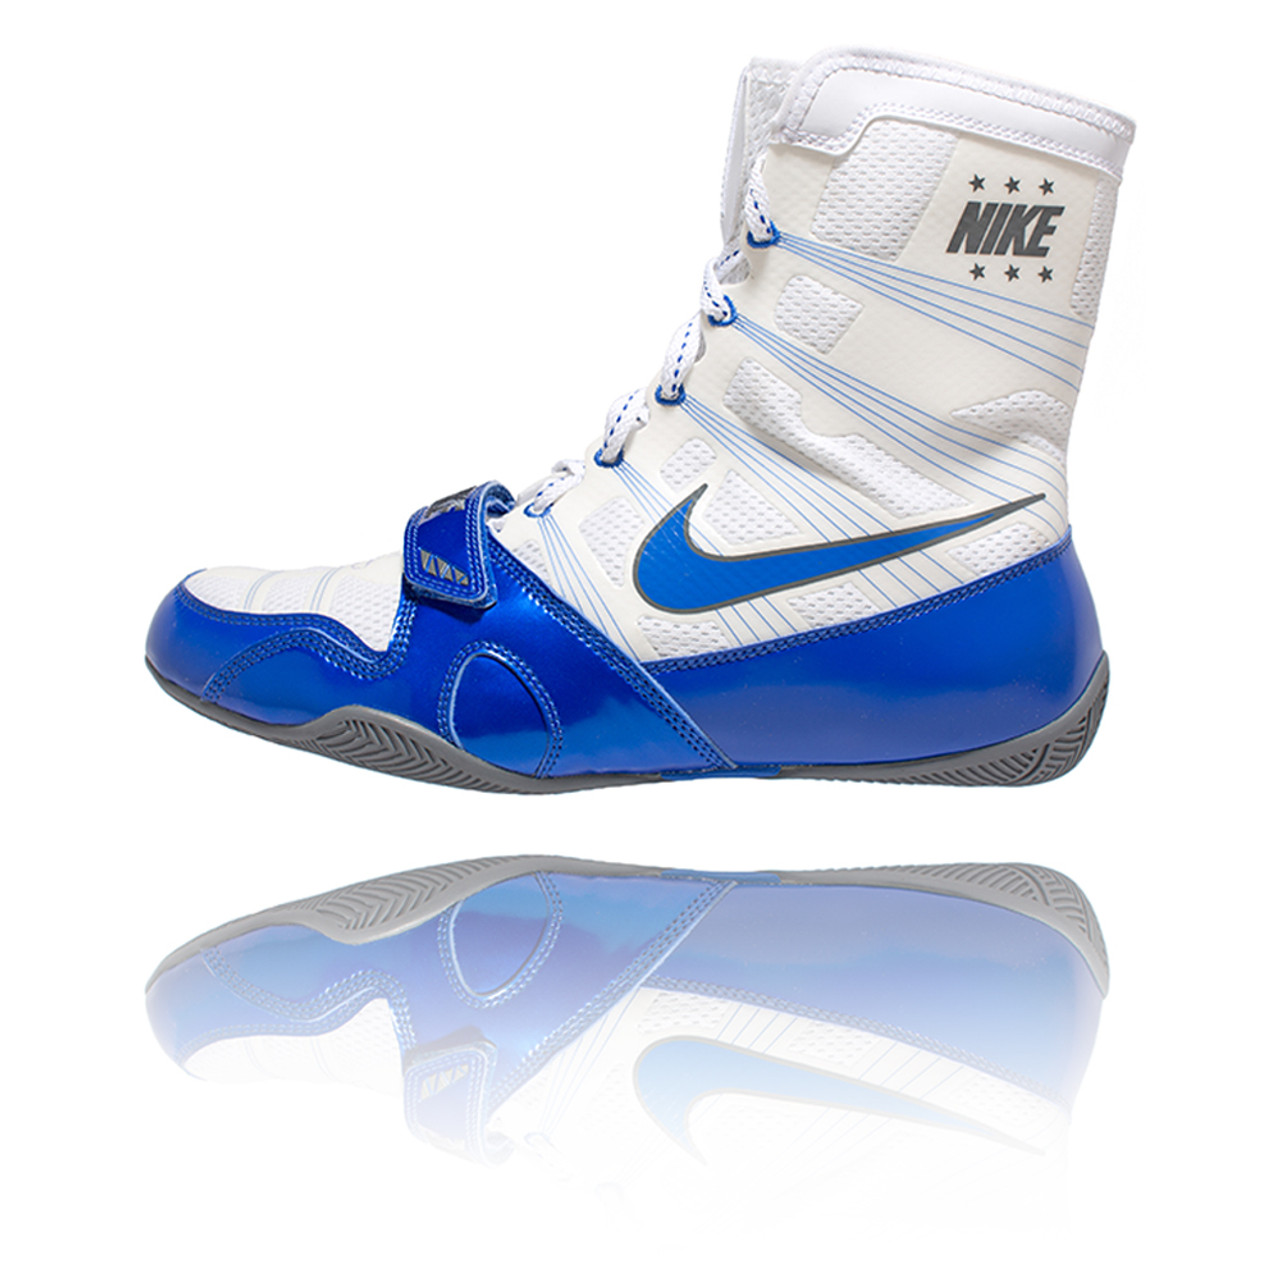 Nike HyperKO - White/Game Royal